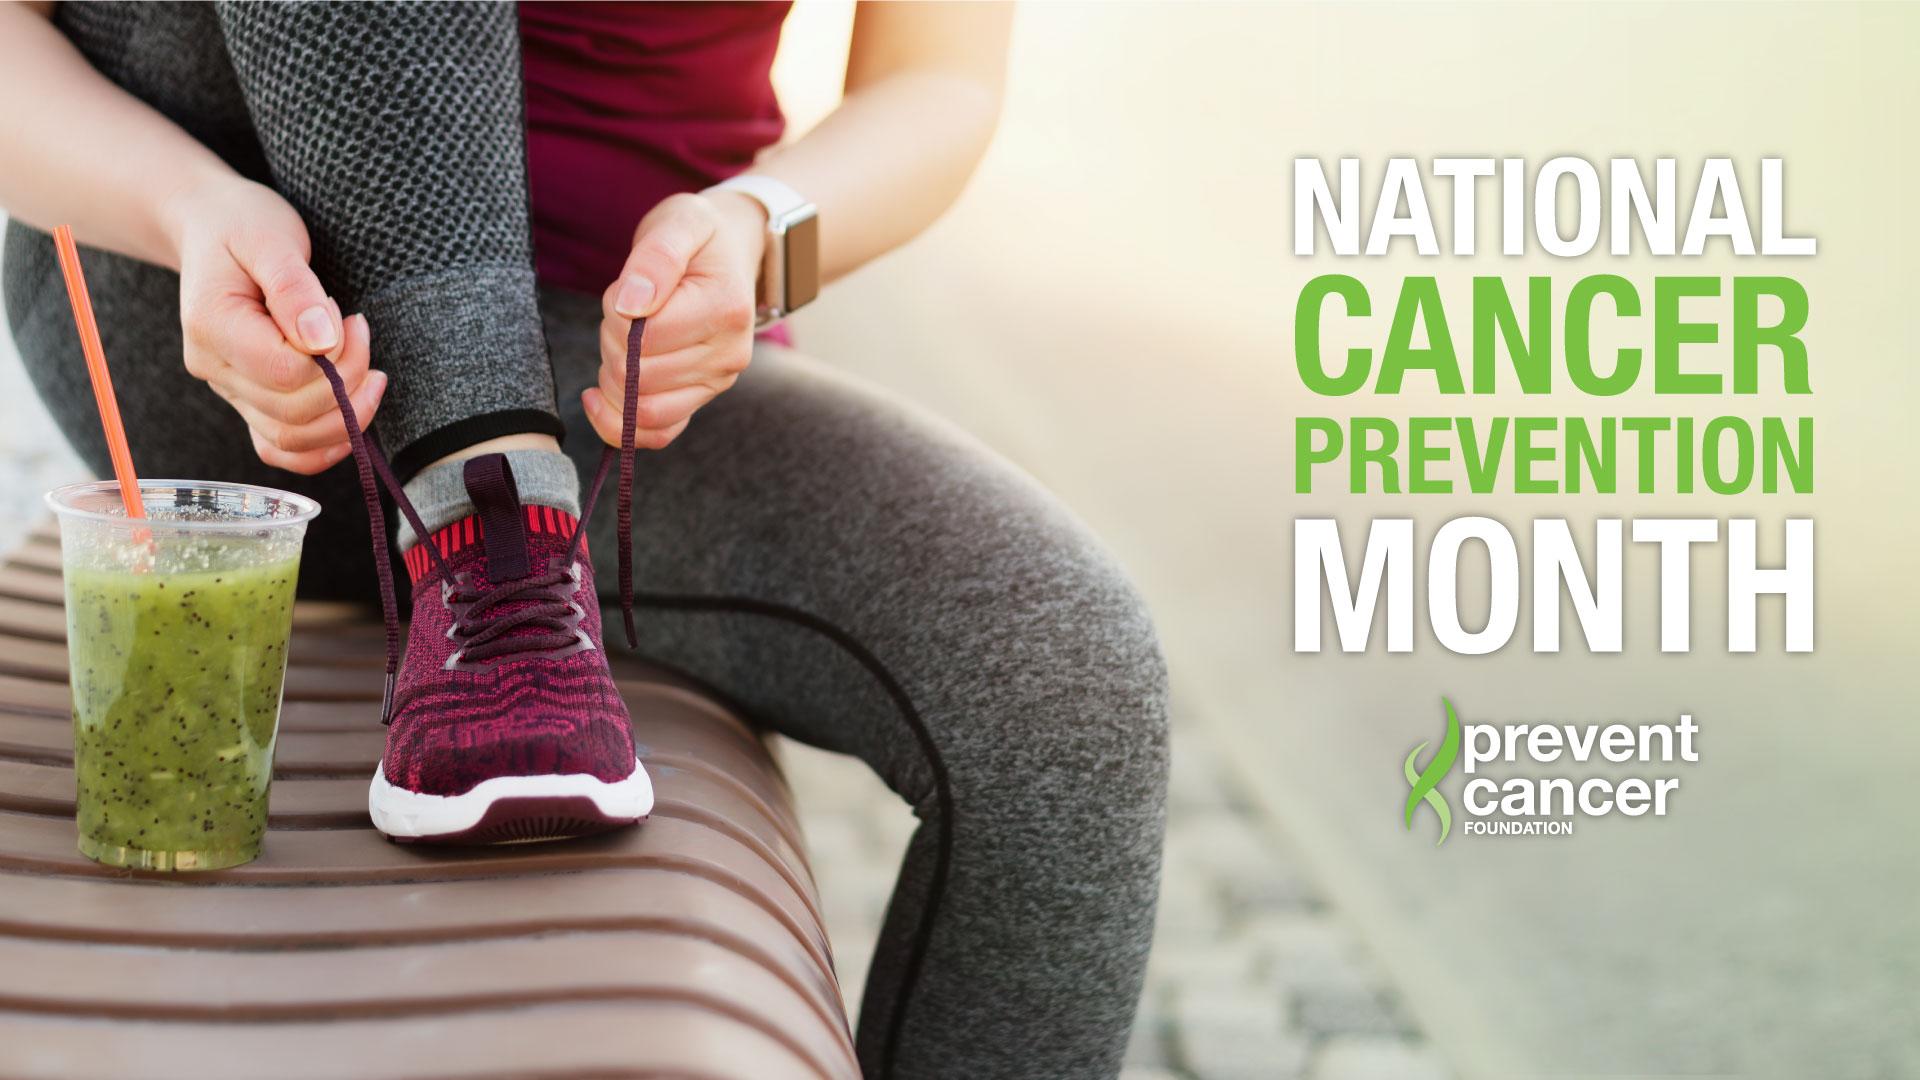 National Cancer Prevention Month - Prevent Cancer Foundation